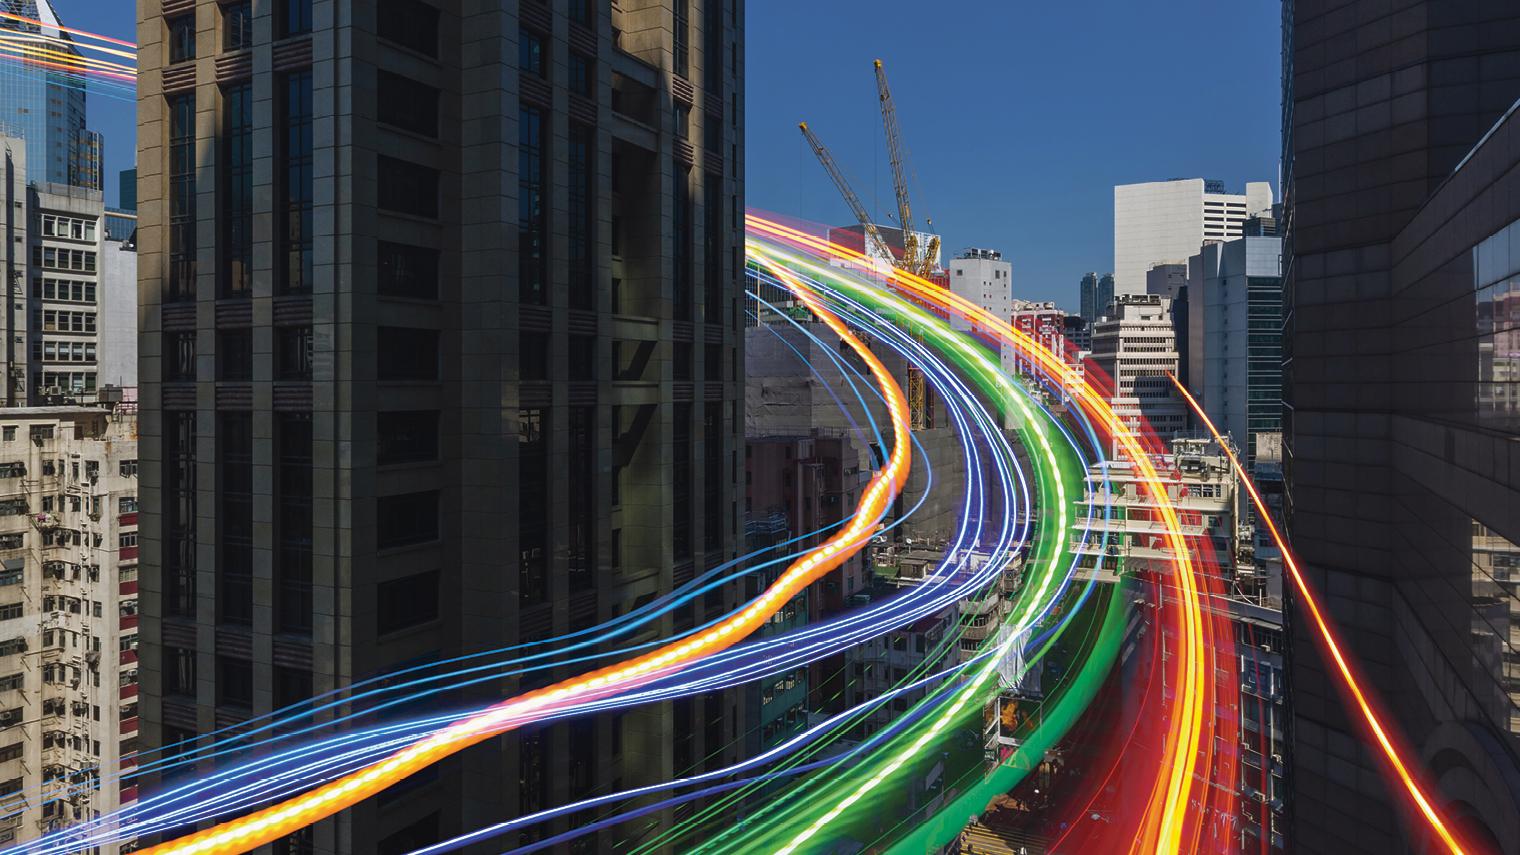 Sped traffic long exposure